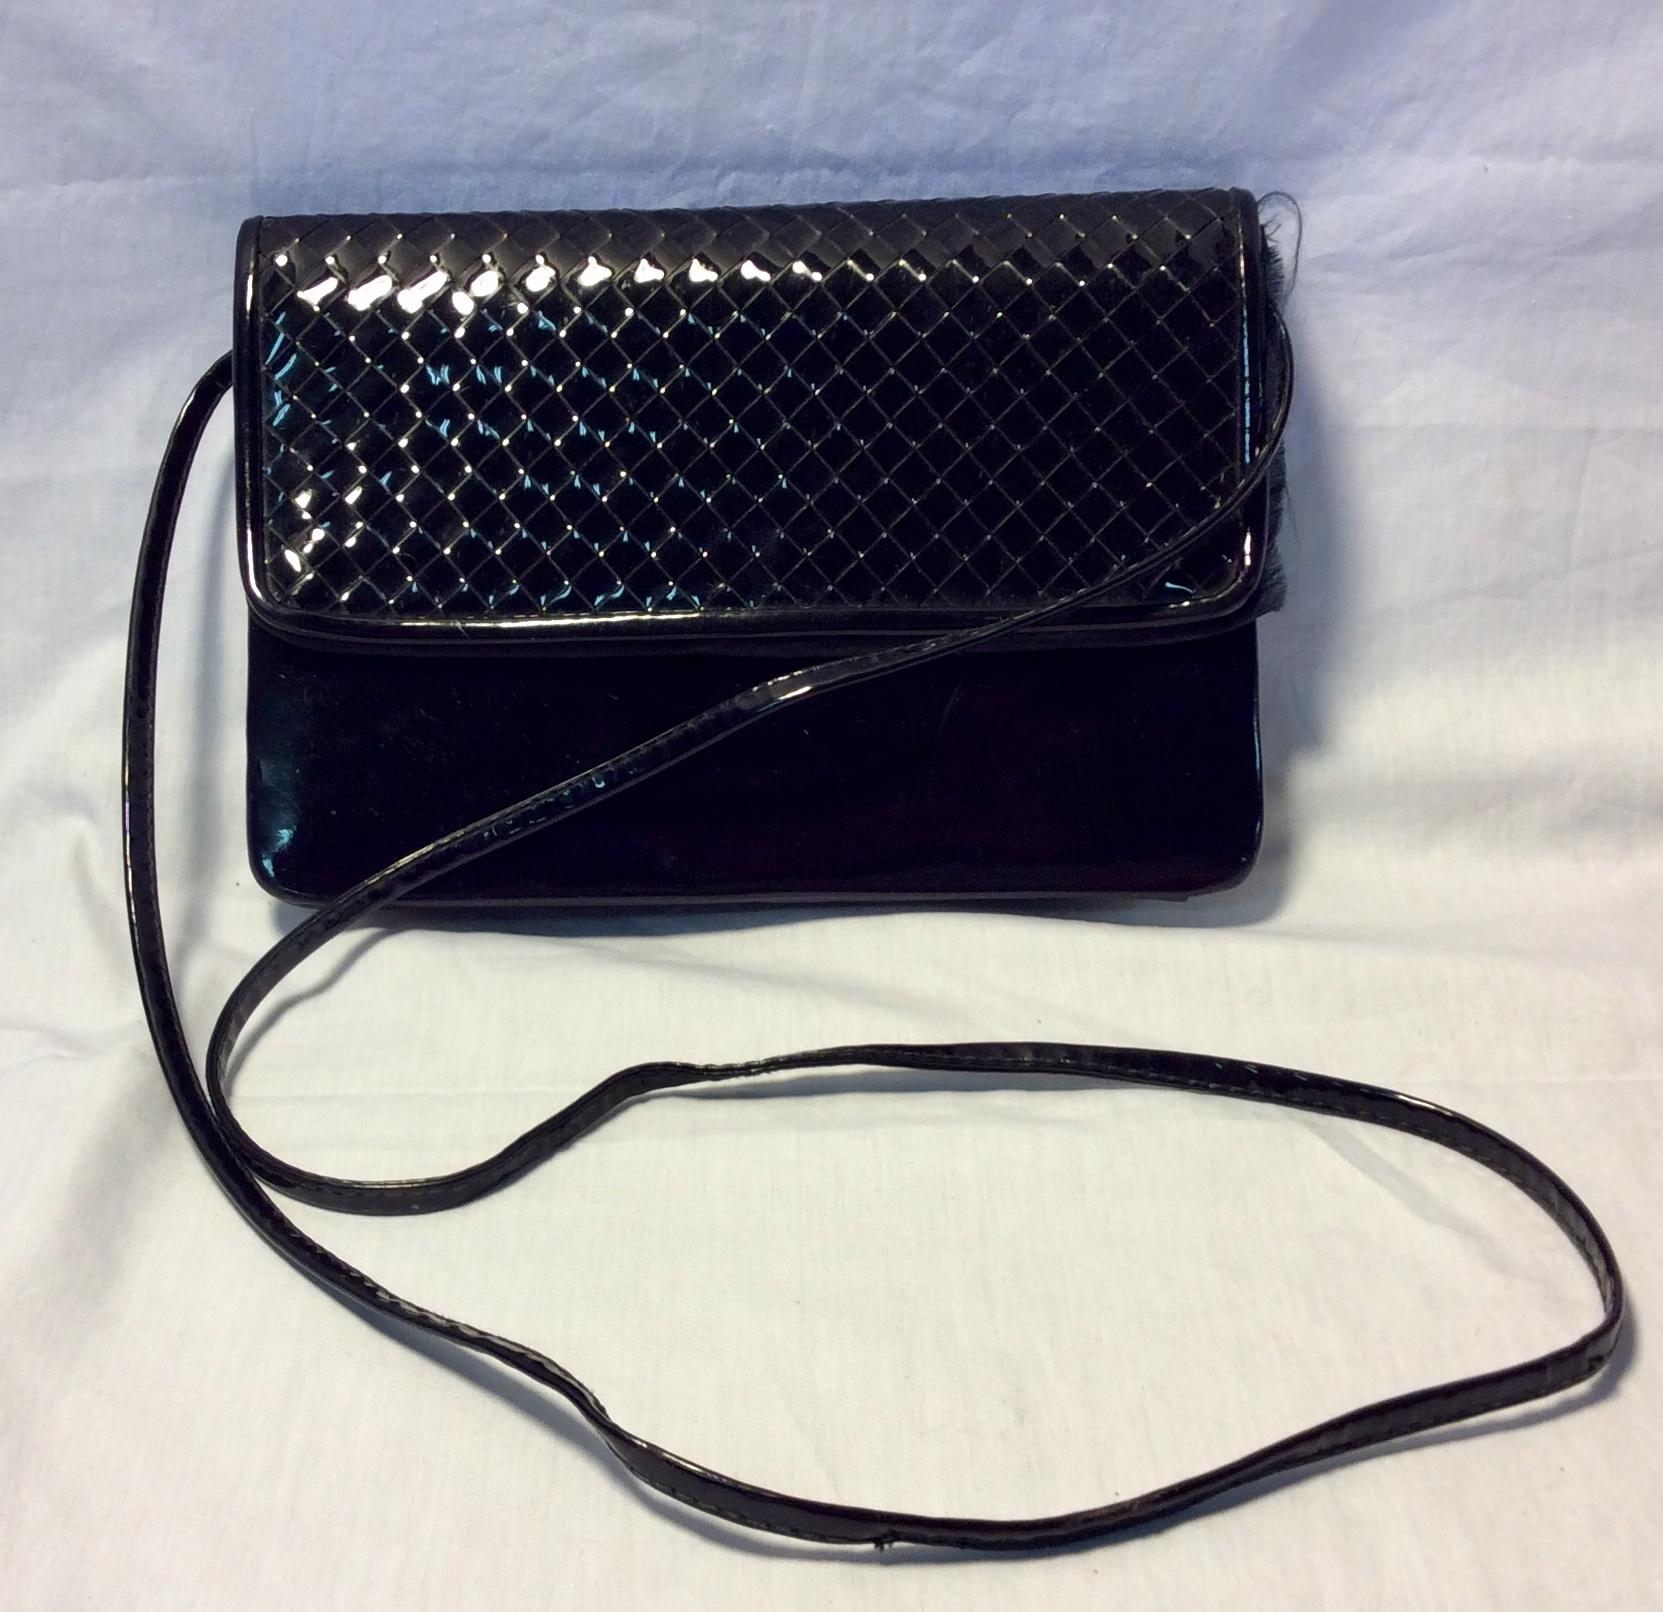 Shiny black pleather purse